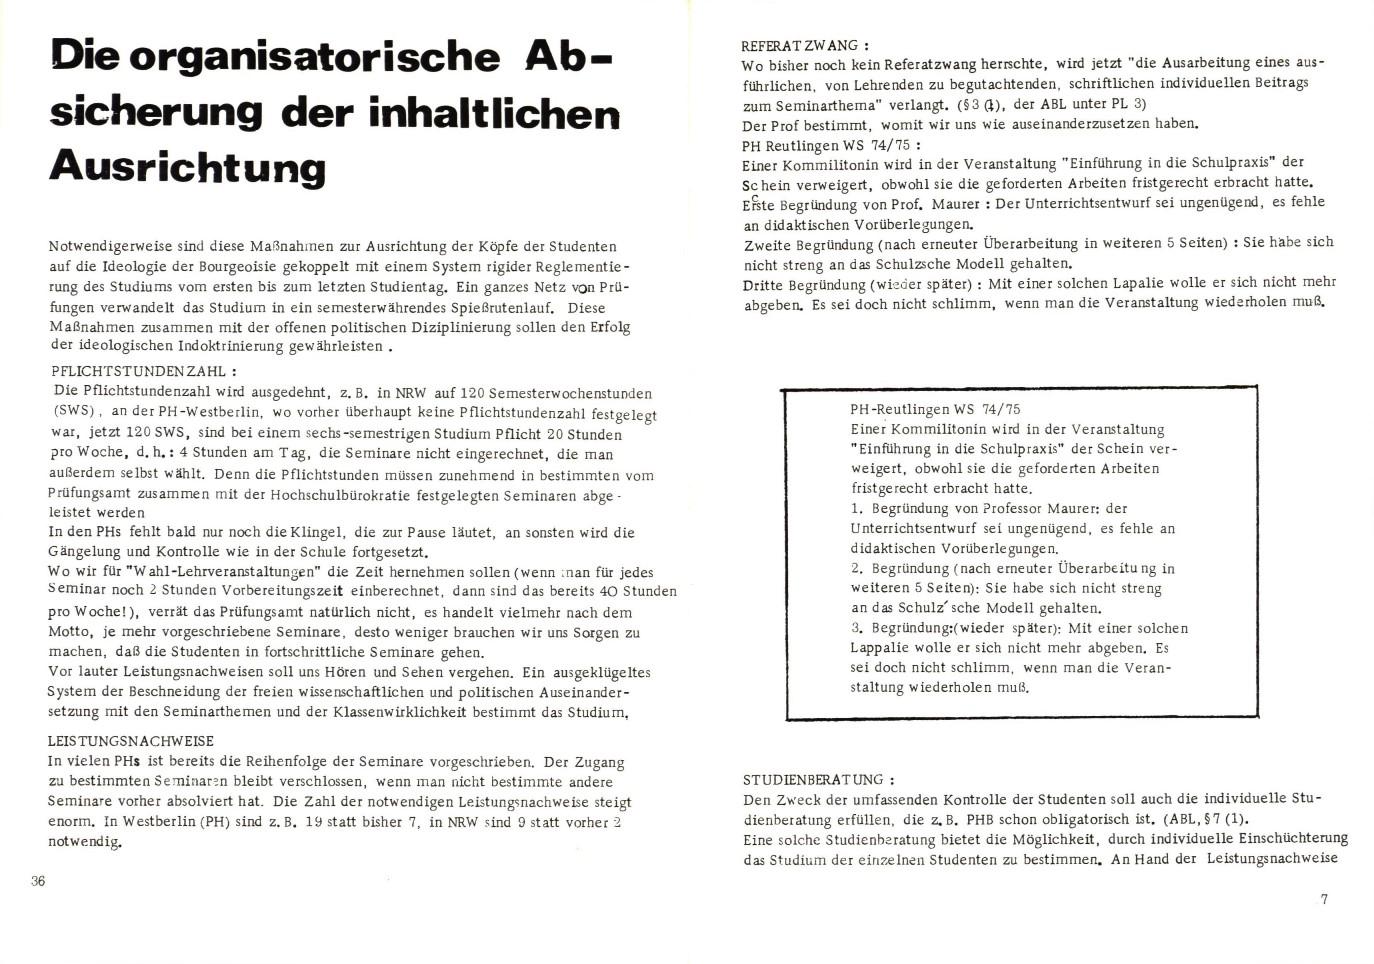 KSV_1975_Lehrerausbildung_19